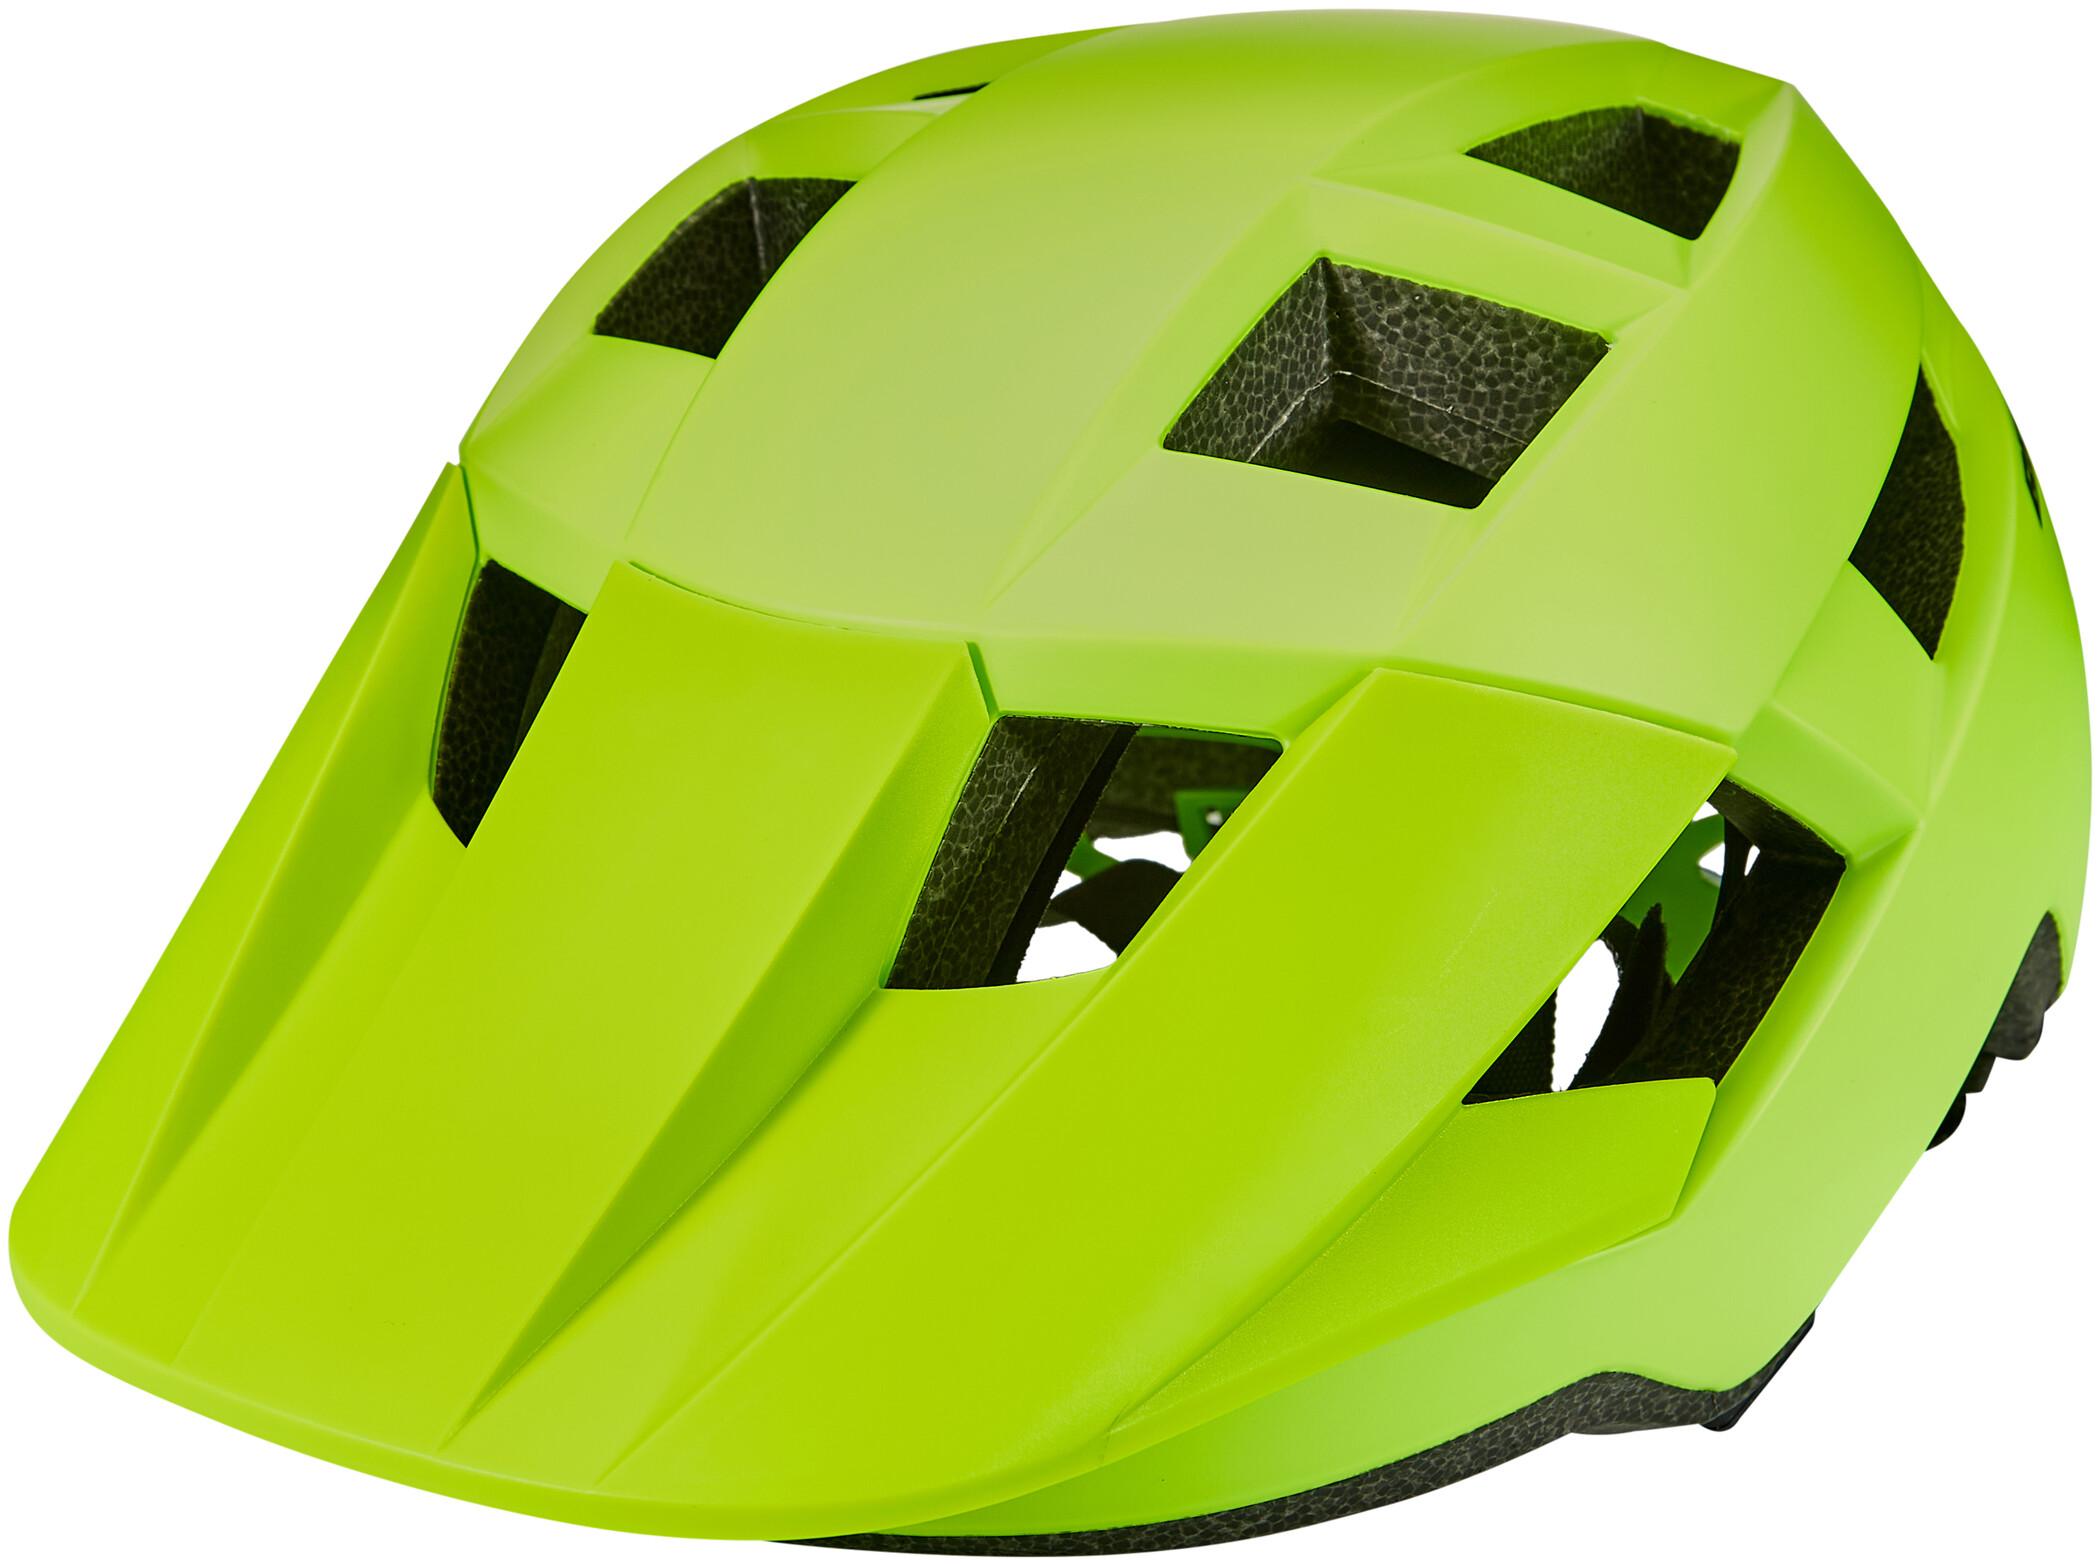 S NETKK Motocross Helme Downhill Helme mtb fullface helm Gr/ün Wei/ß